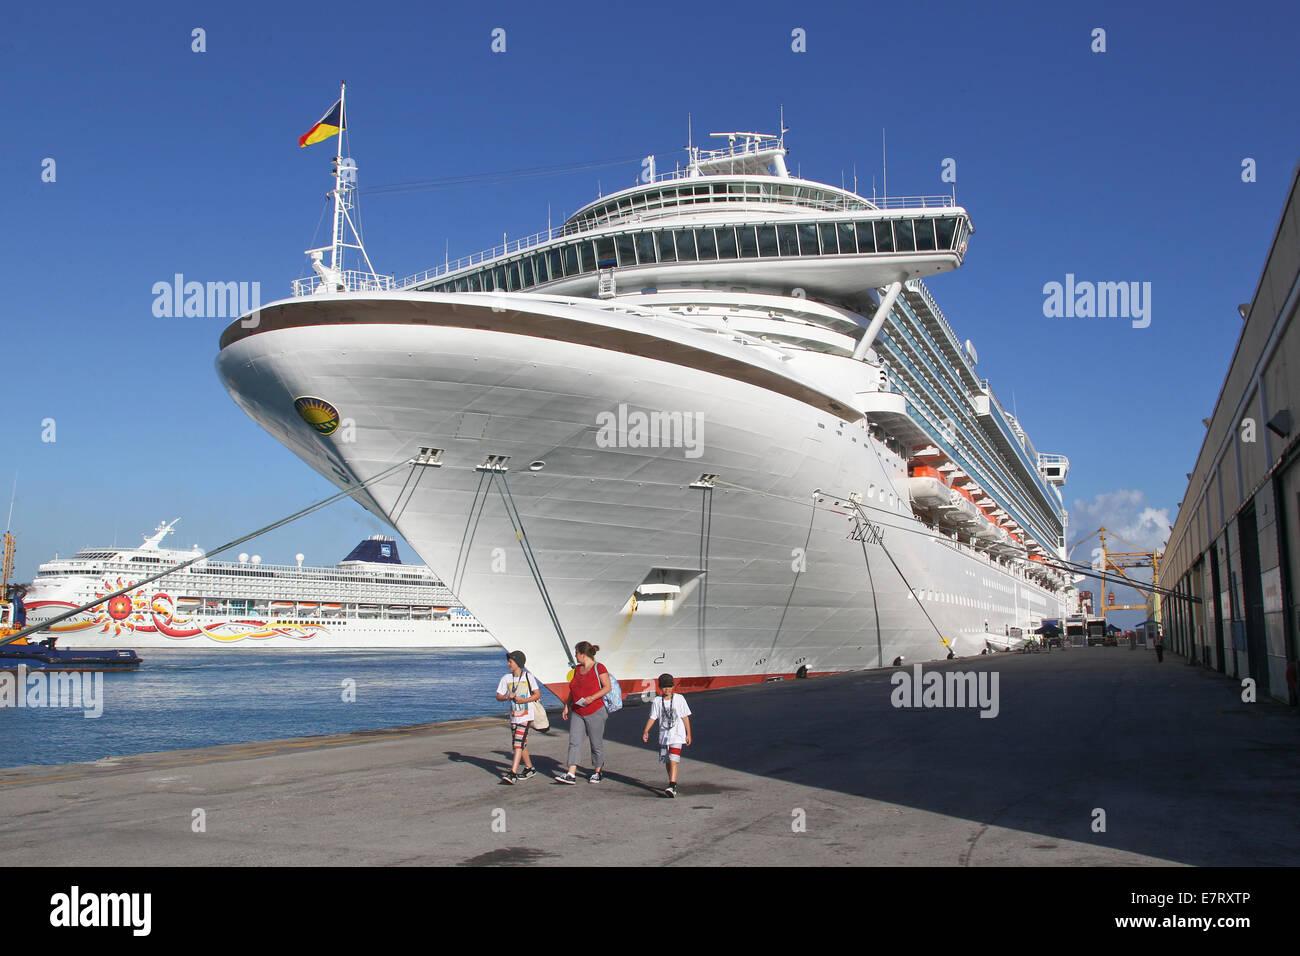 Passenger Ship, Cruise ship, AZURA, Passengers, Port, Shore trip, Holiday, Cruise - Stock Image